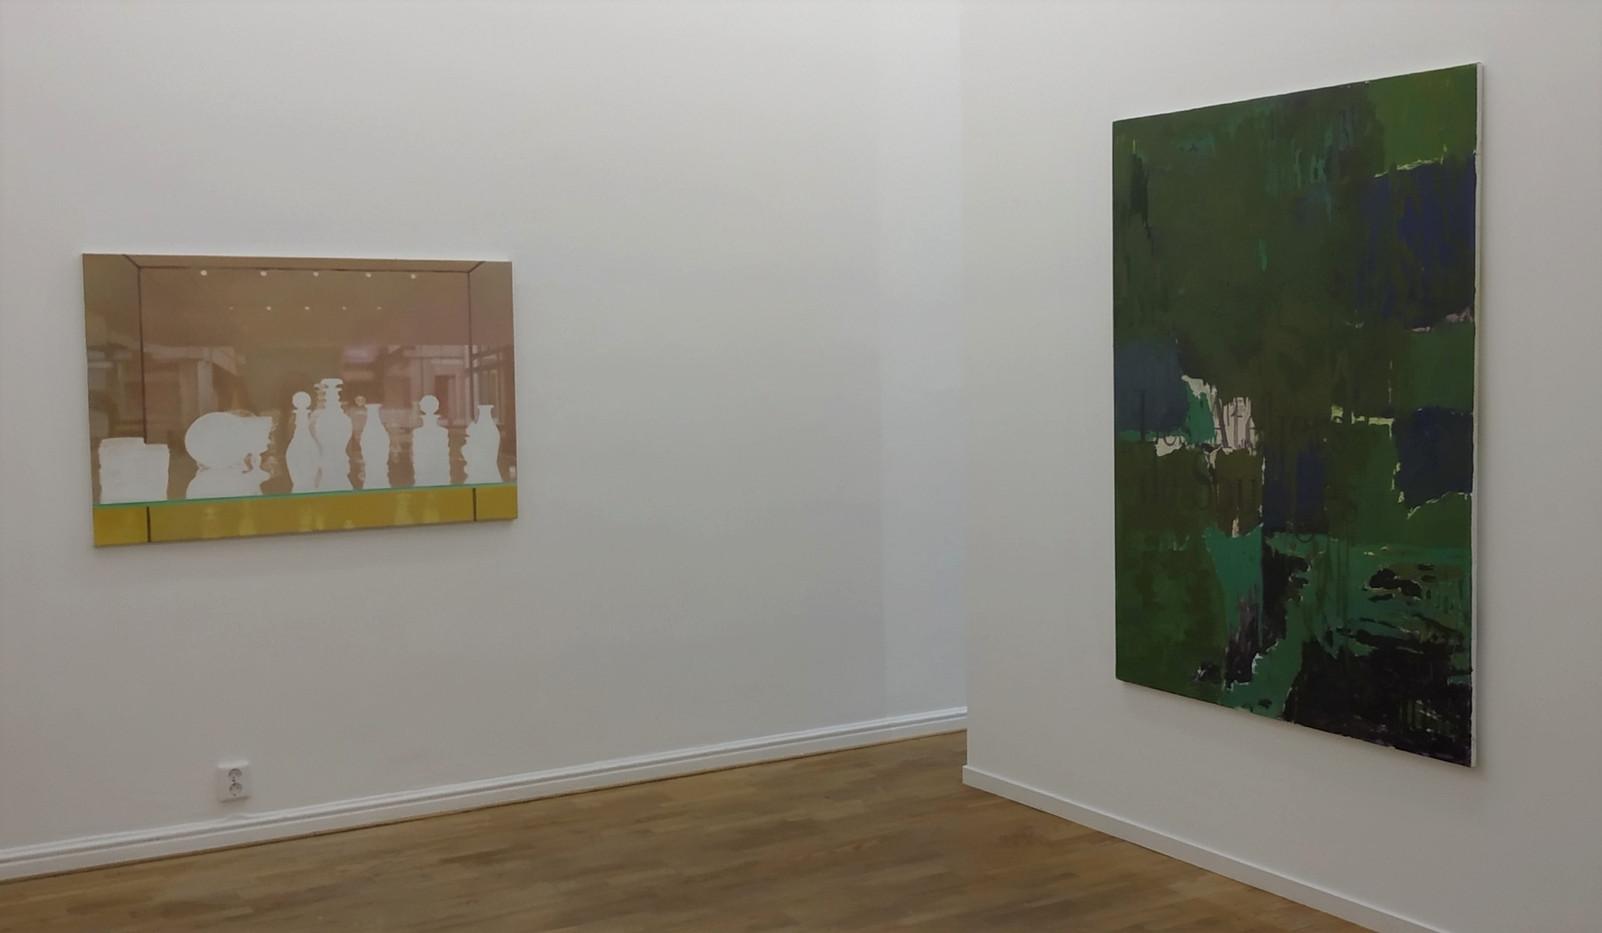 Works by Anette Harboe Flensburg and Kehnet Nielsen